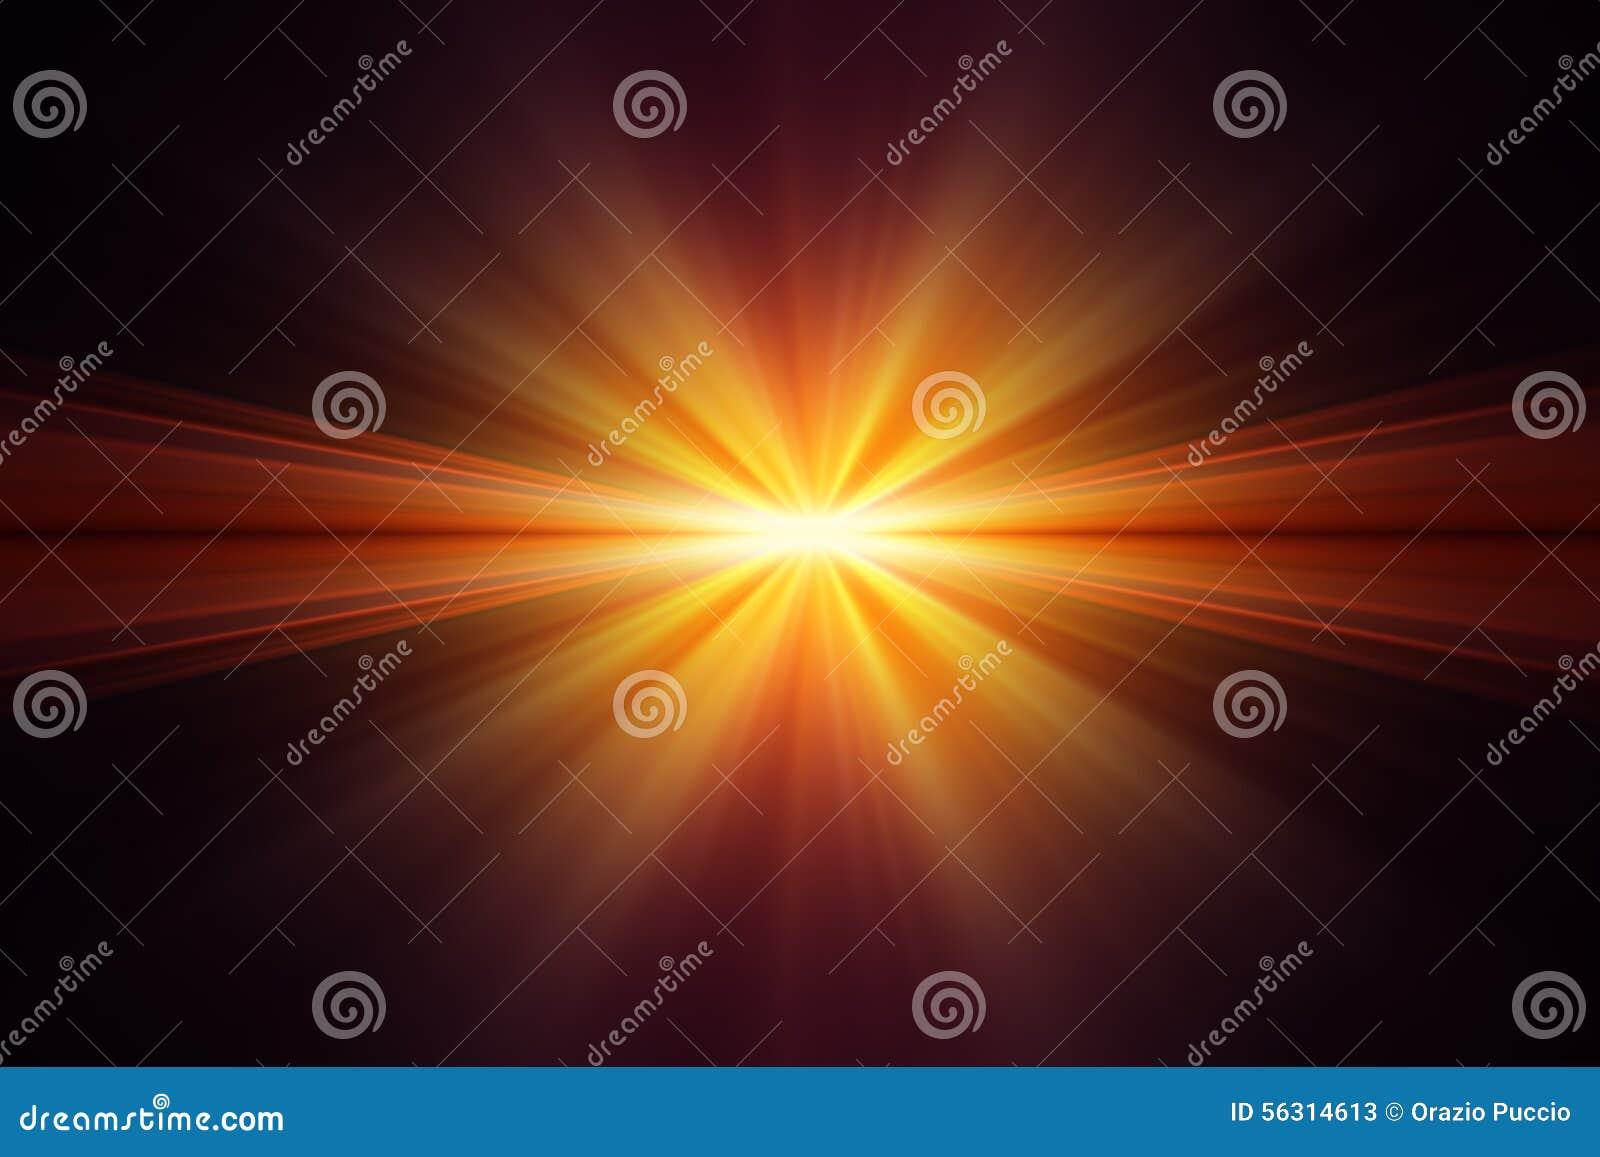 Explosion Of Yellow Light On Black Background Stock Image - Image ... for Yellow Light Rays Background  110zmd